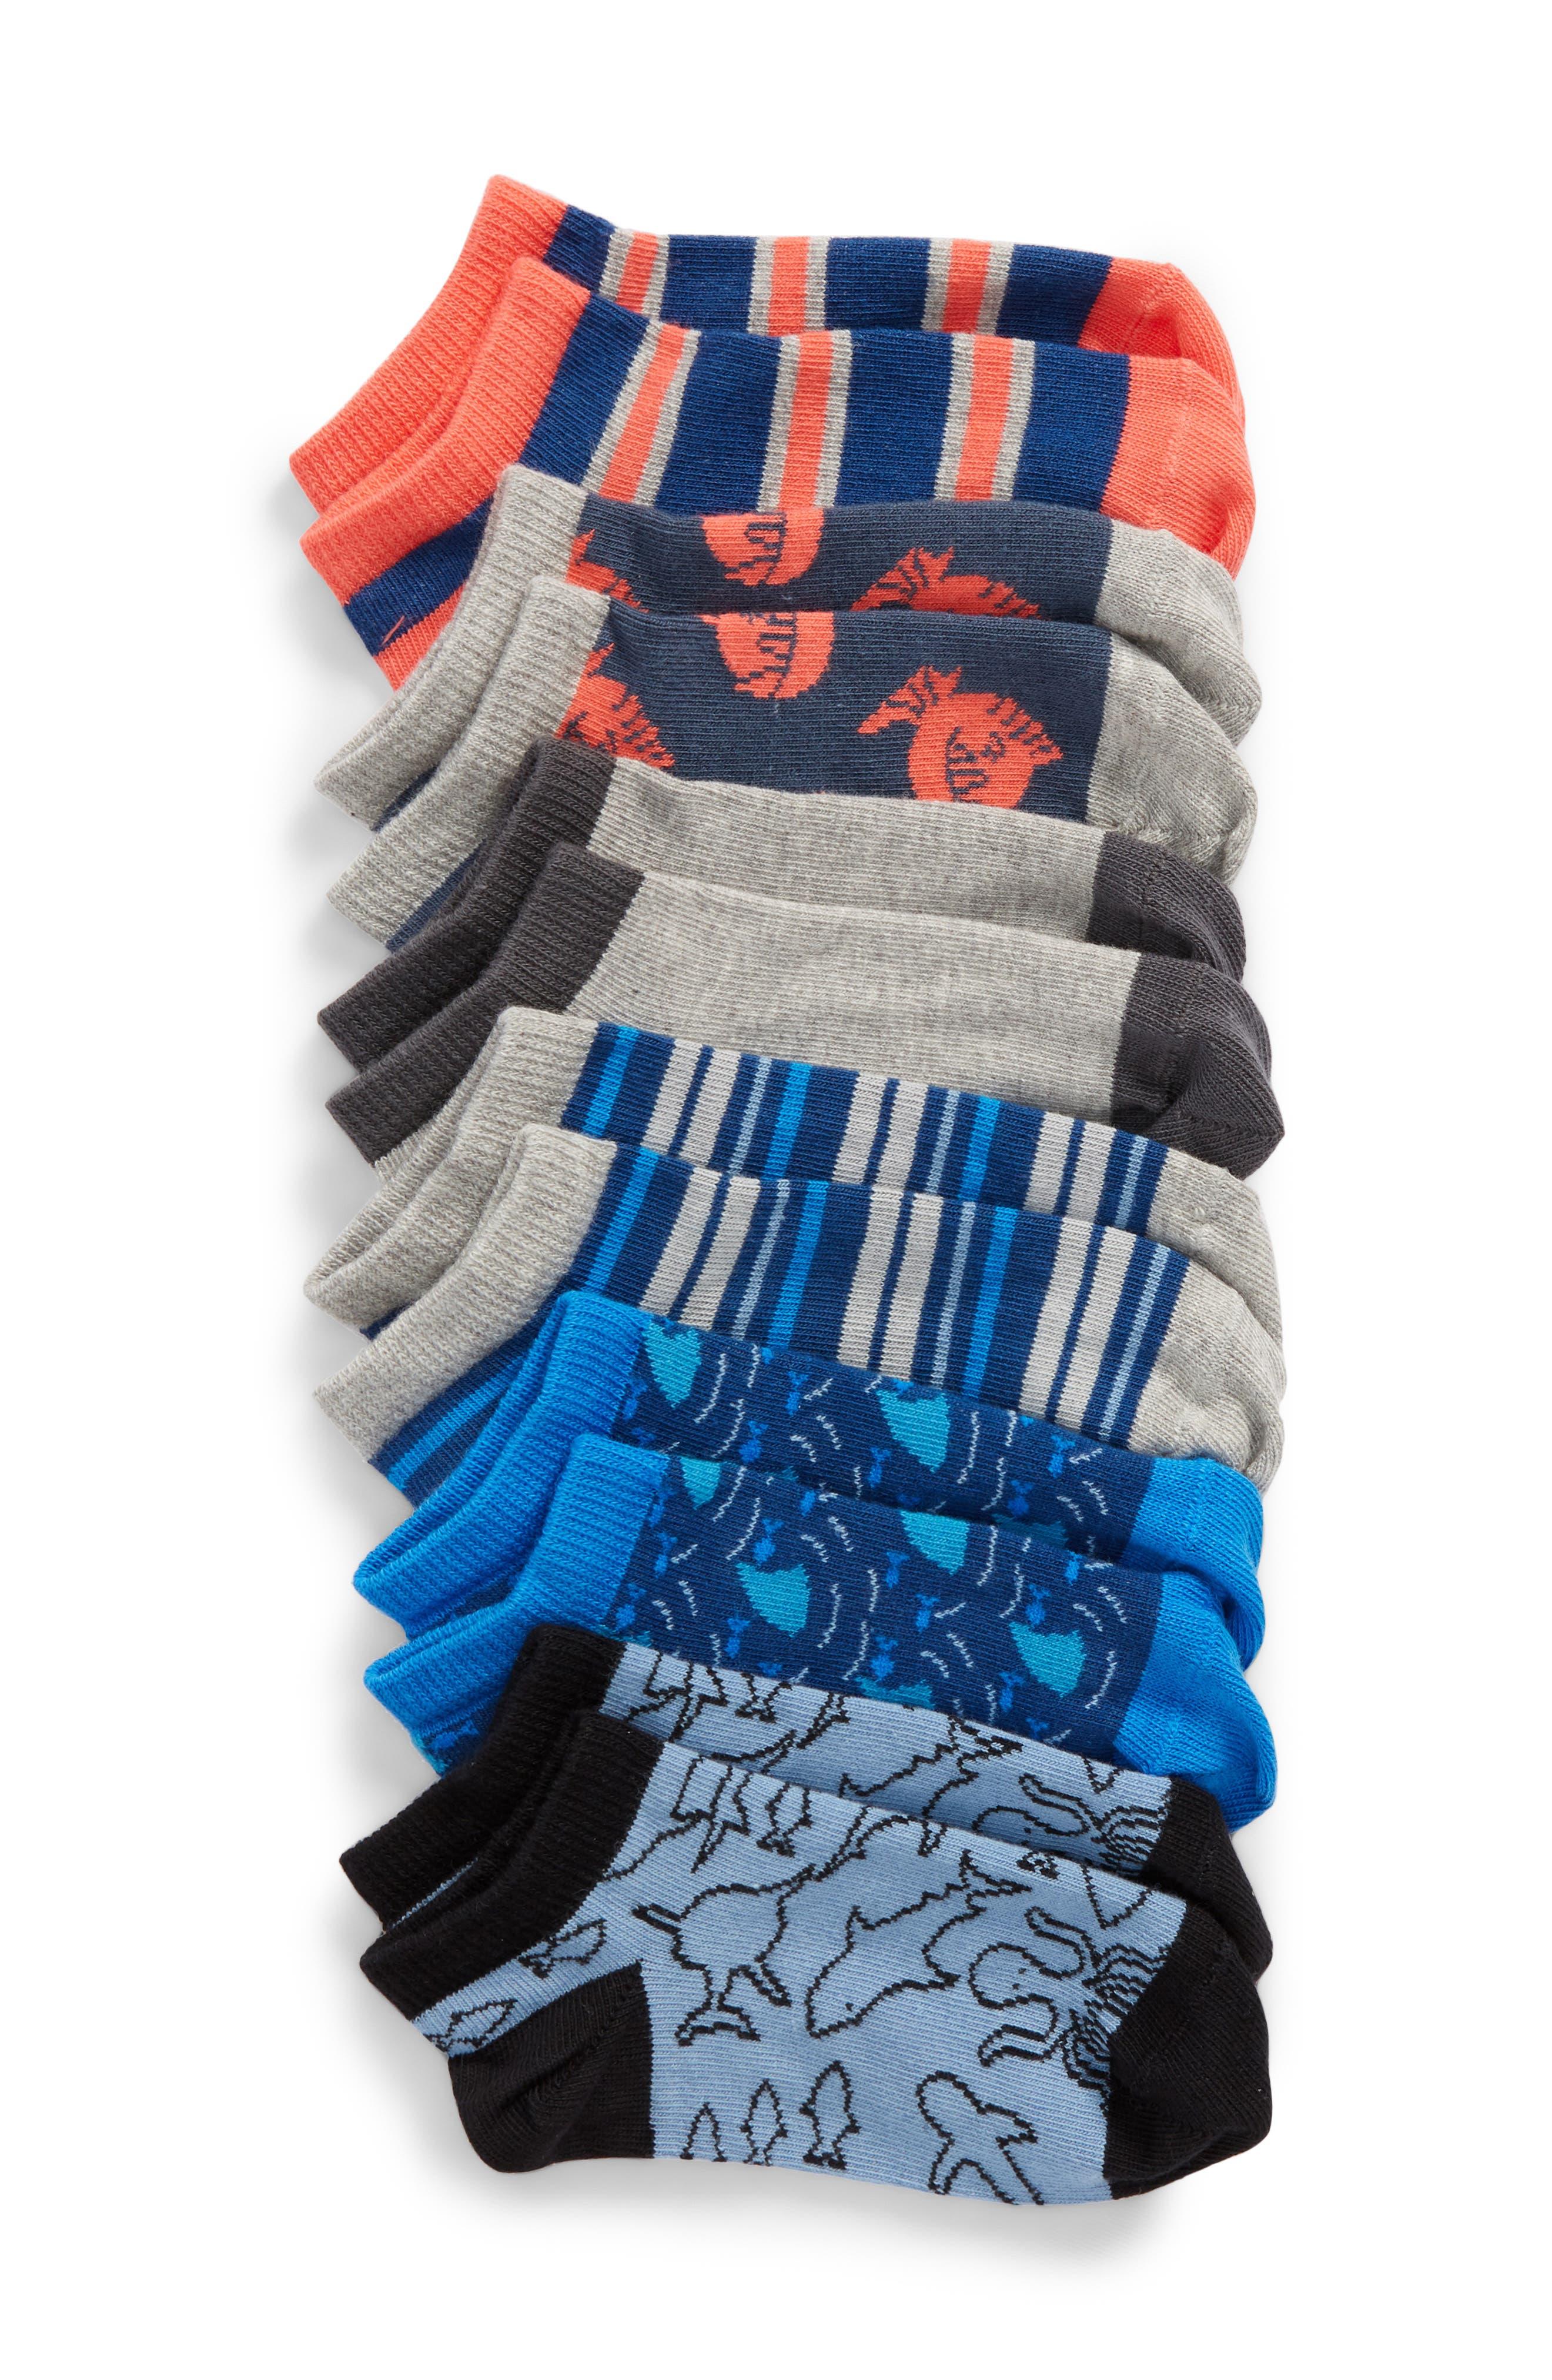 6-Pack Puffer Fish Low Cut Socks,                         Main,                         color, BLUE CLOUD MULTI